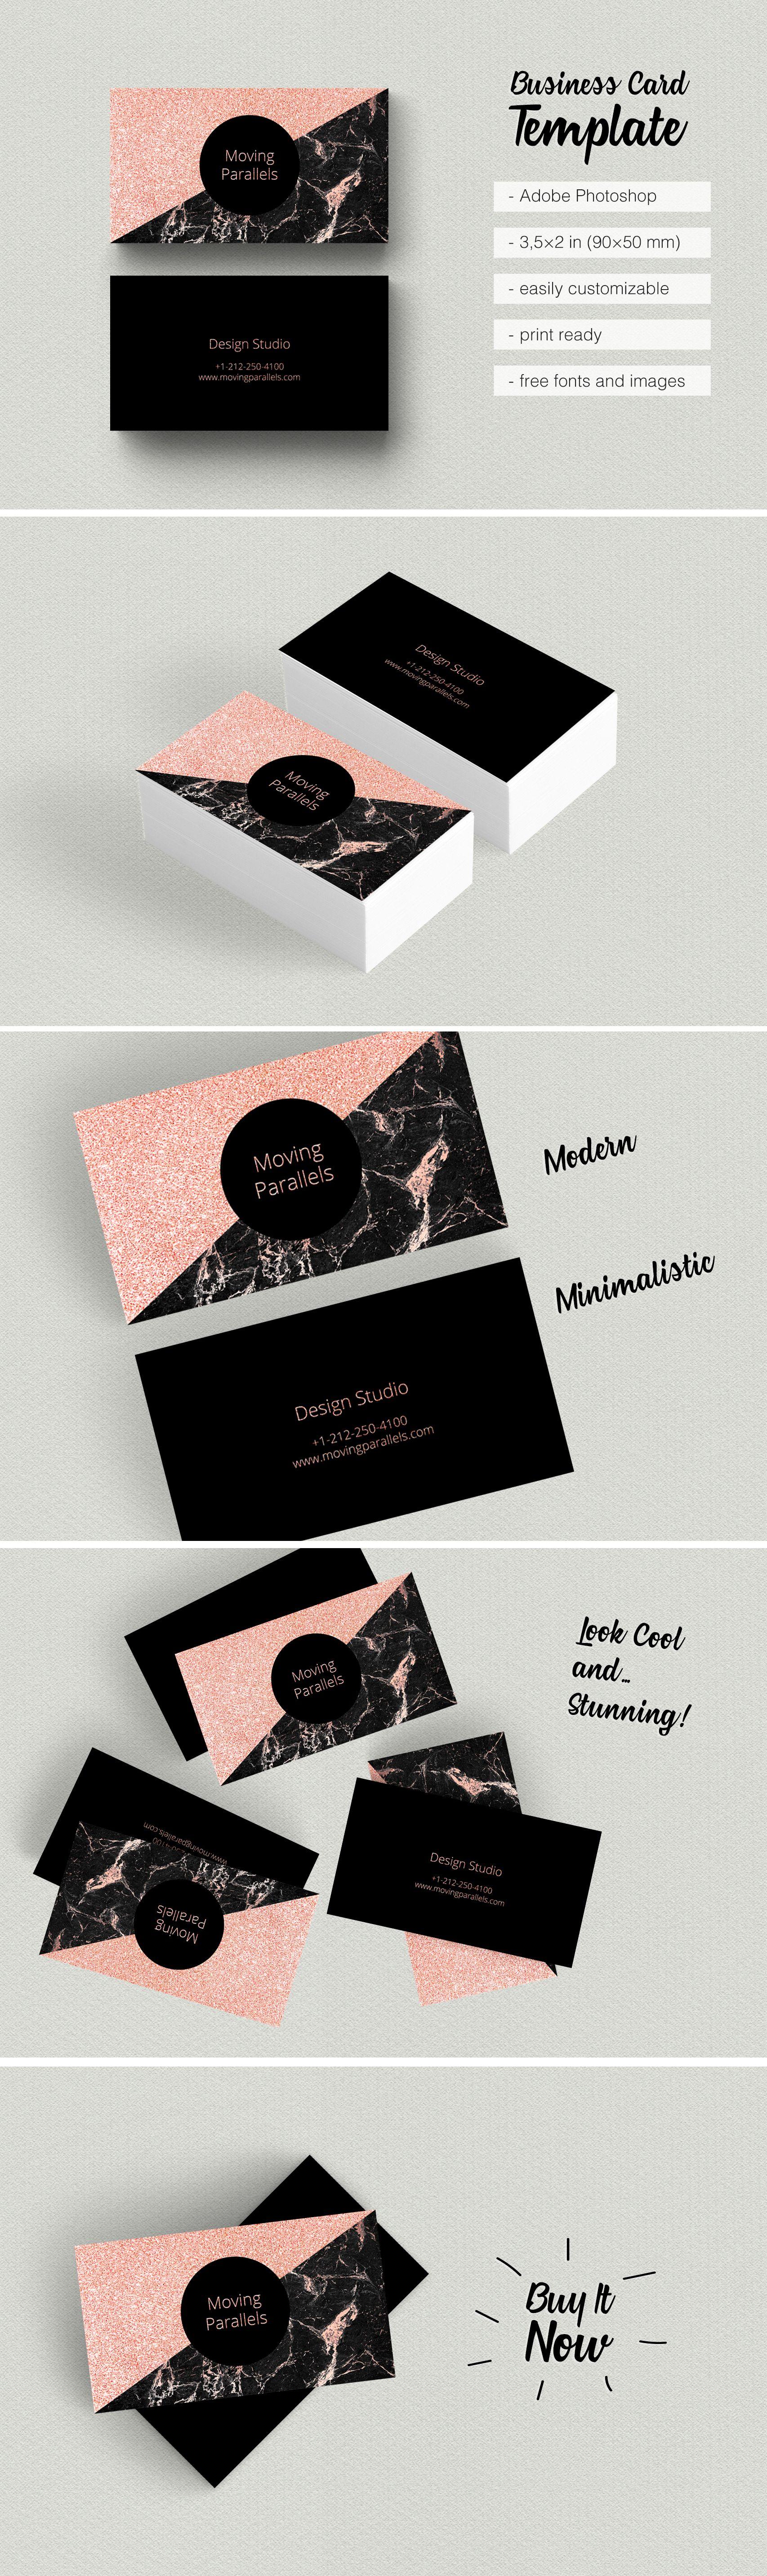 Canva Rose Gold White Black Marble Glitter Foil Business Etsy Visiting Card Templates Rose Gold Business Card Gold Business Card